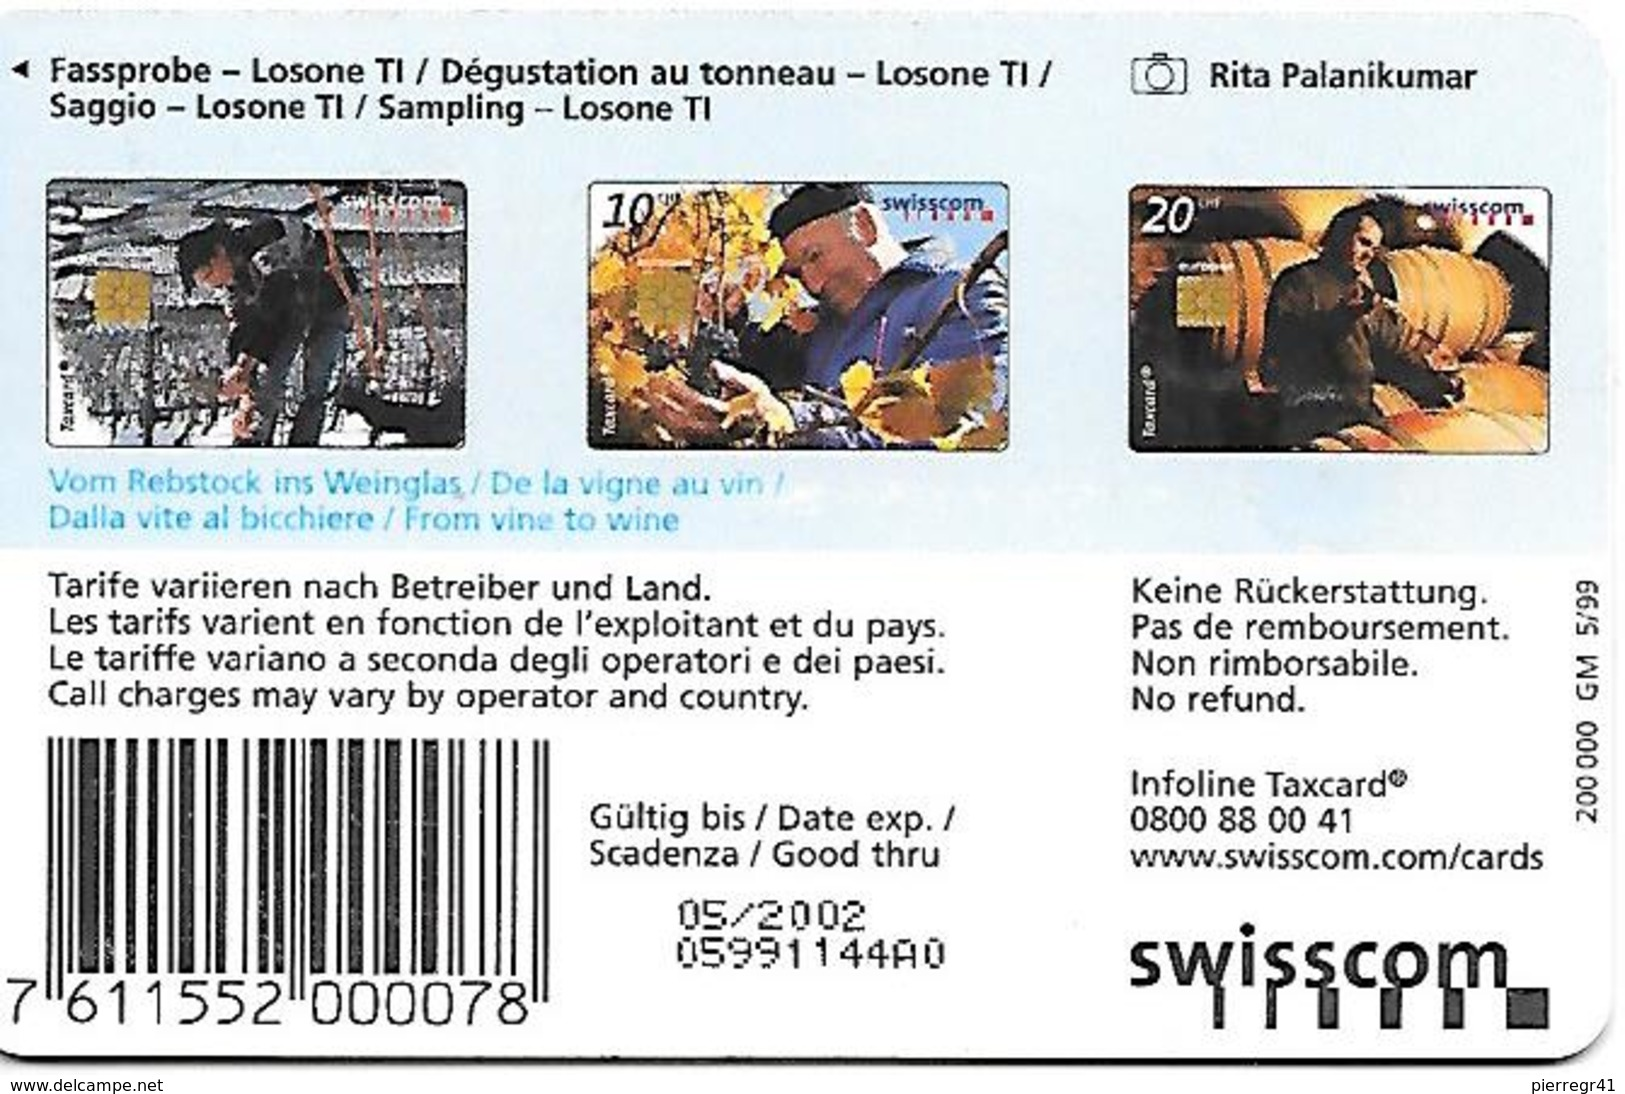 CARTE-PUCE-SUISSE-20CHF-TAXCARD-VIN-Dégustation Au Tonneau-TBE - Schweiz